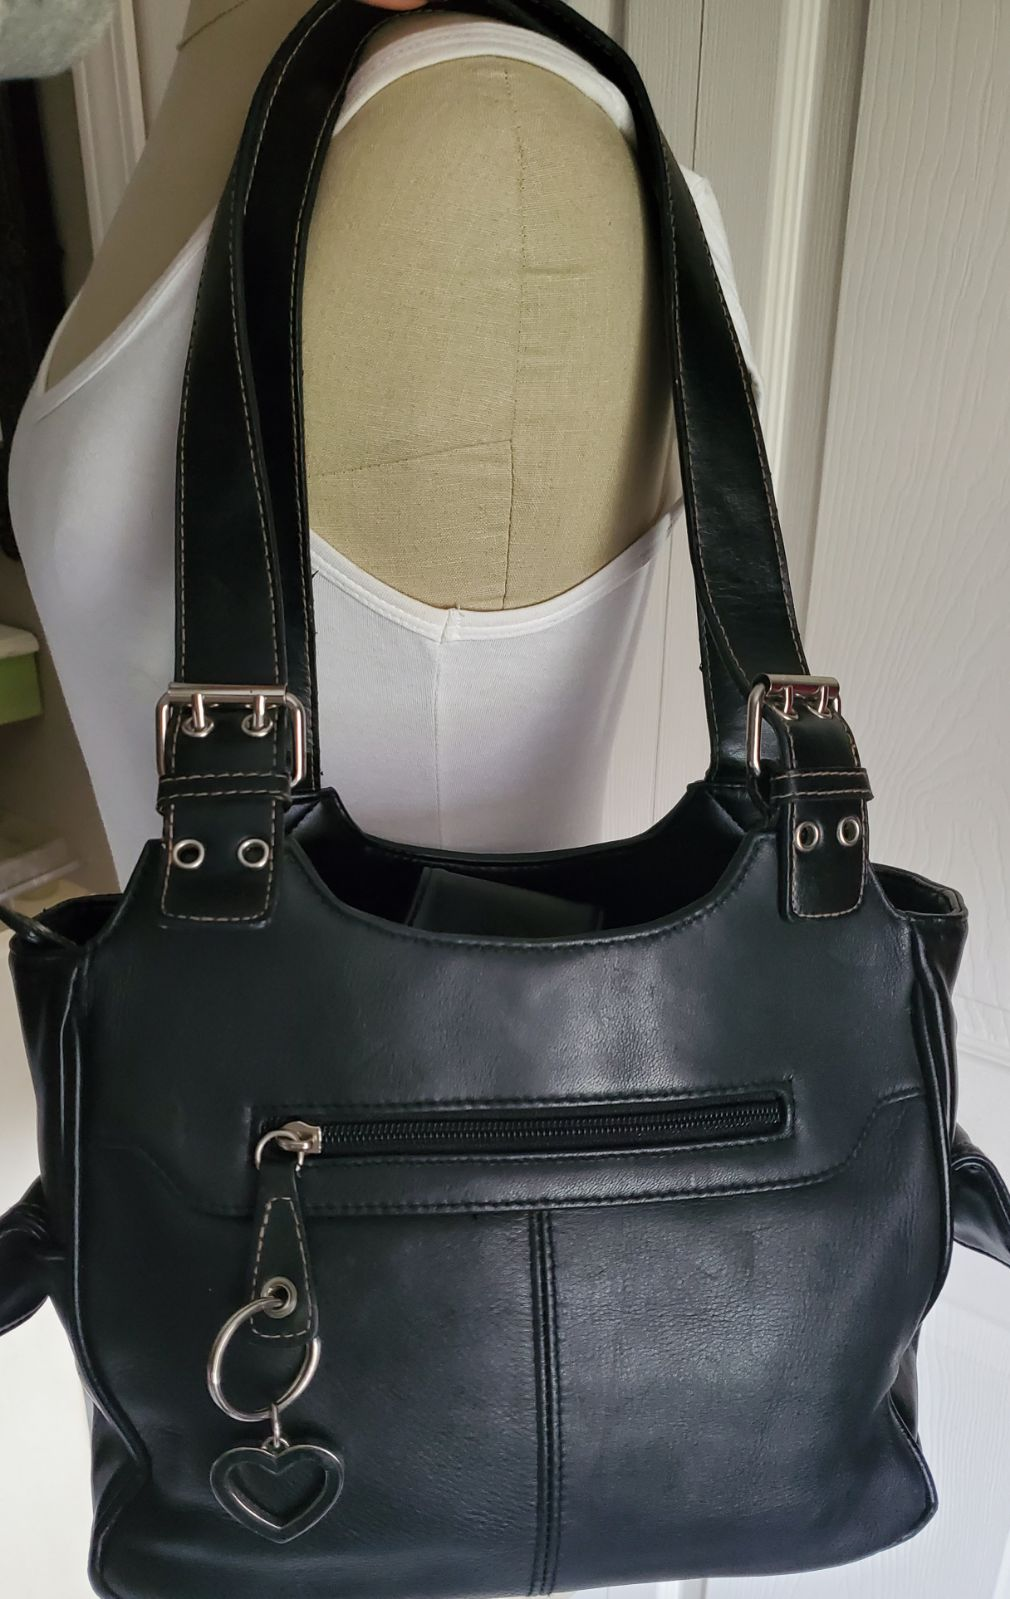 Handbag apostrophe‼️ black leatherette